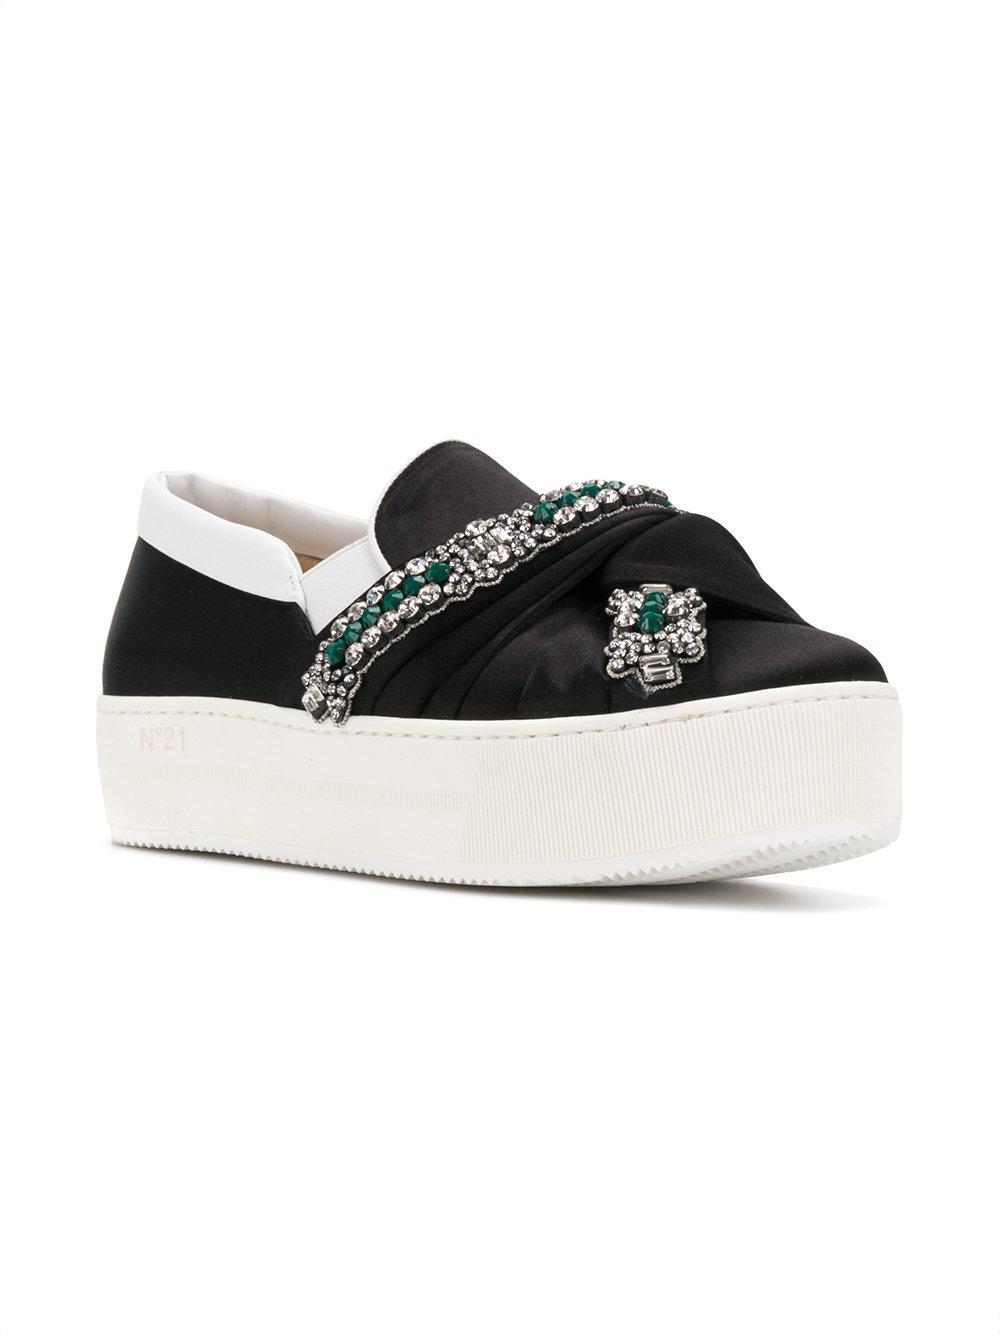 N°21 Silk Knotted Platform Embellished Sneakers in Black